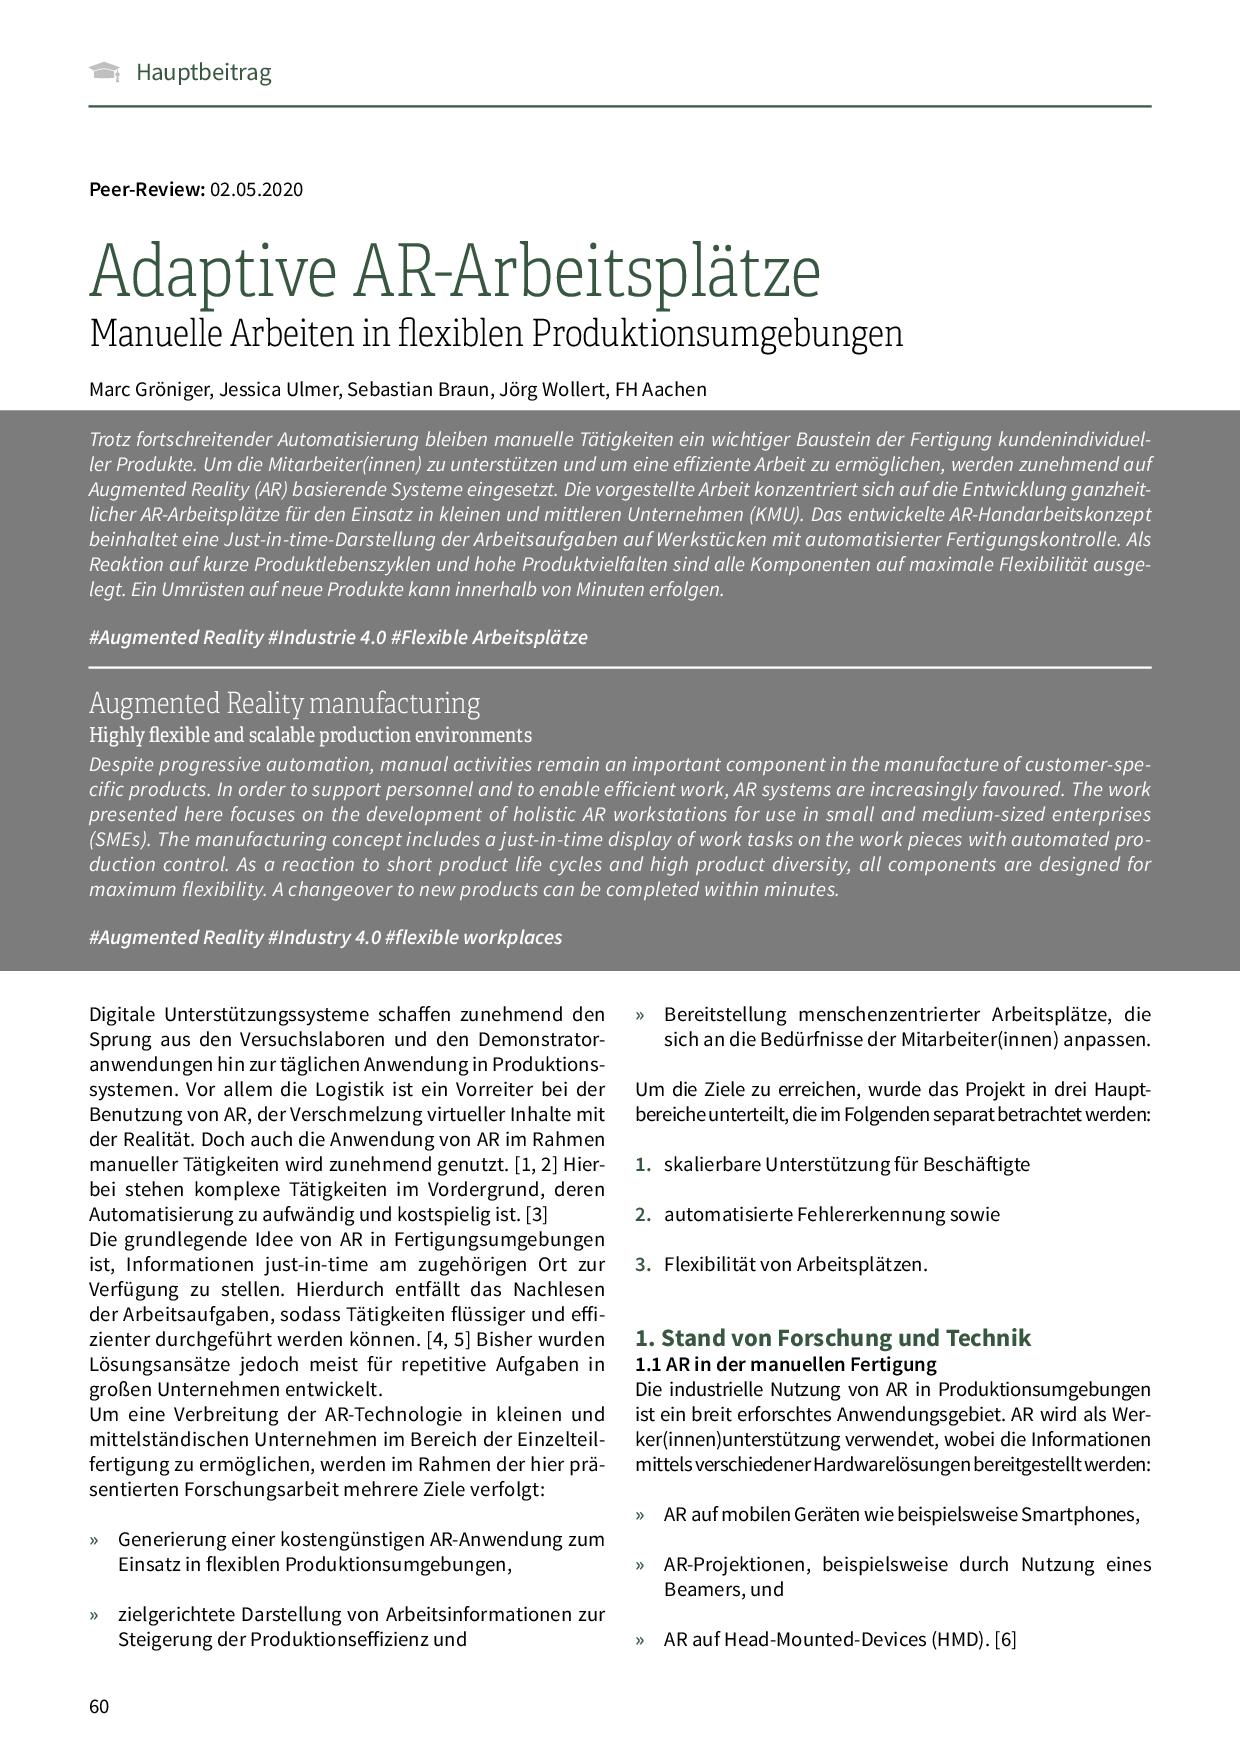 Adaptive AR-Arbeitsplätze